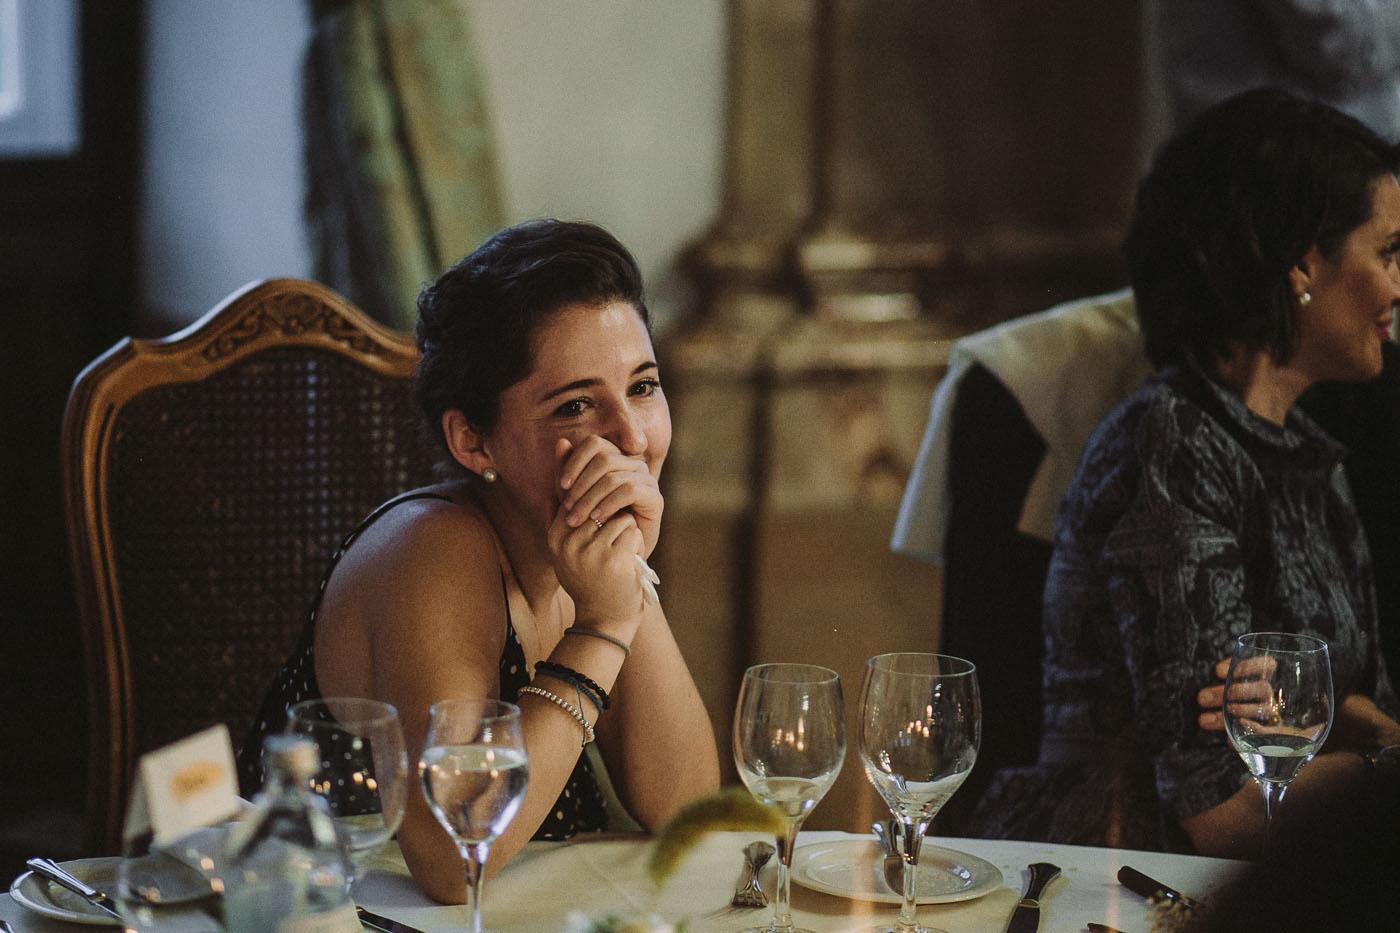 wedding-leopoldskron-photographer-67